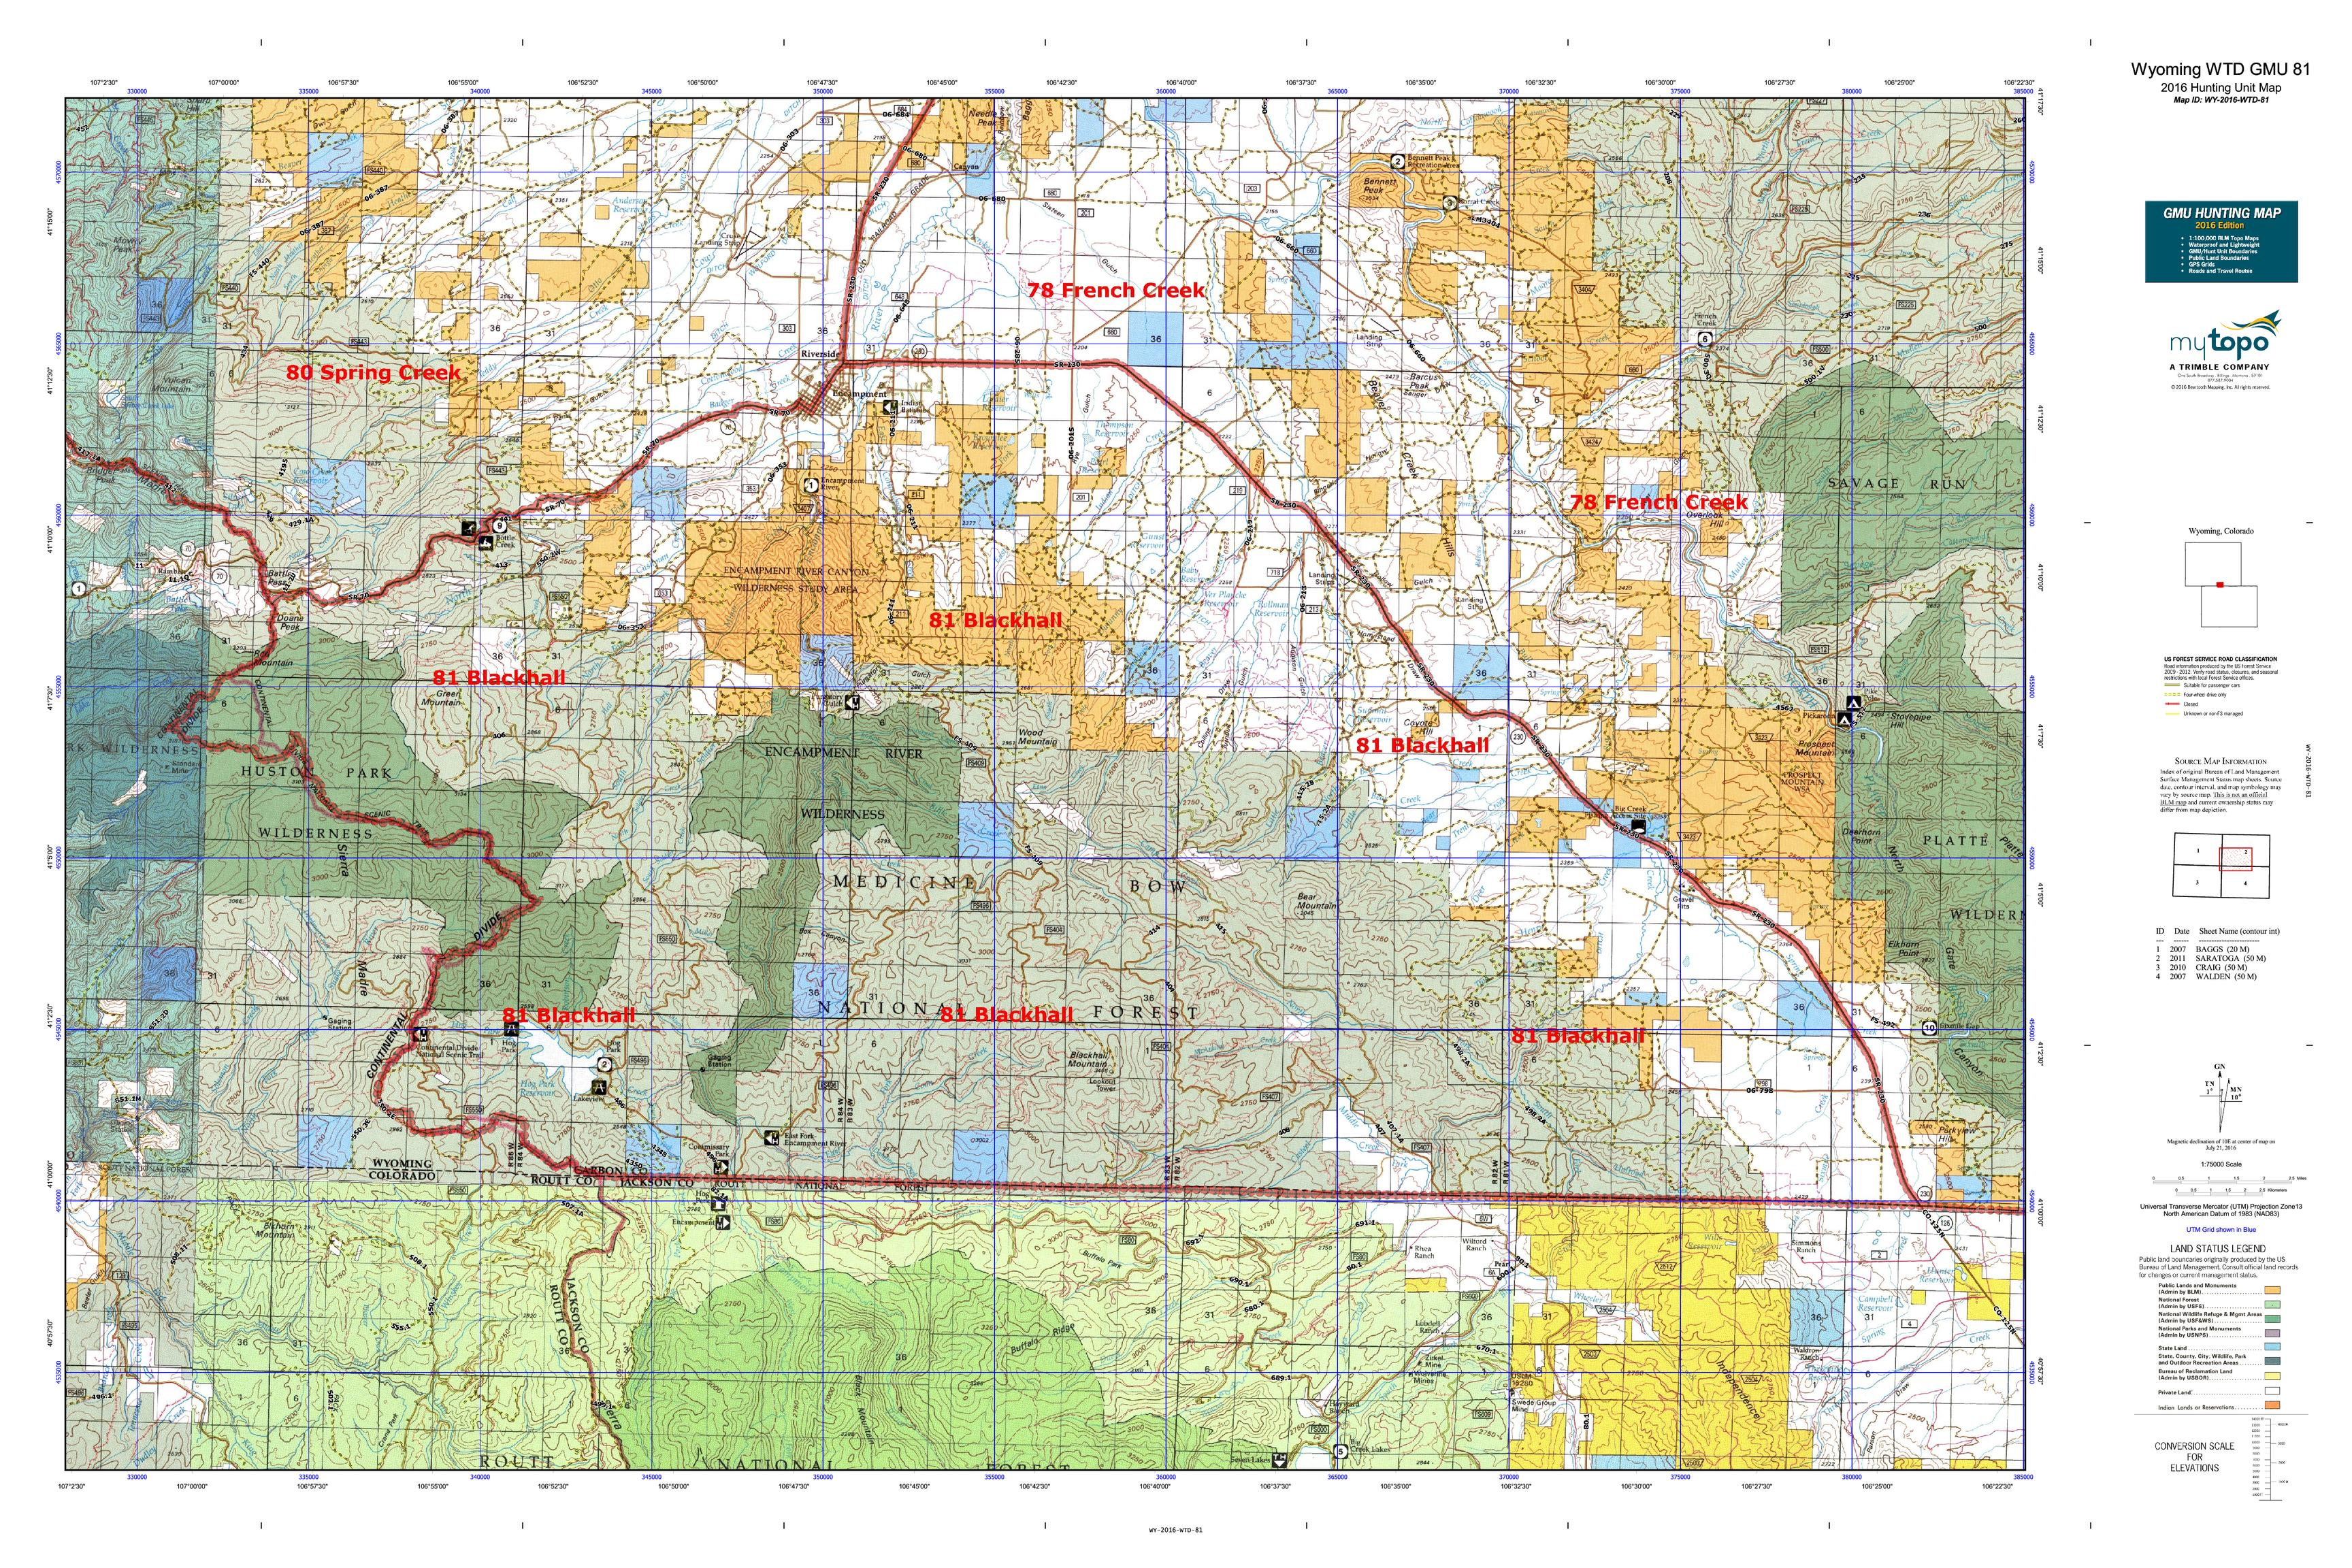 Wyoming WTD GMU  Map MyTopo - Map us 81